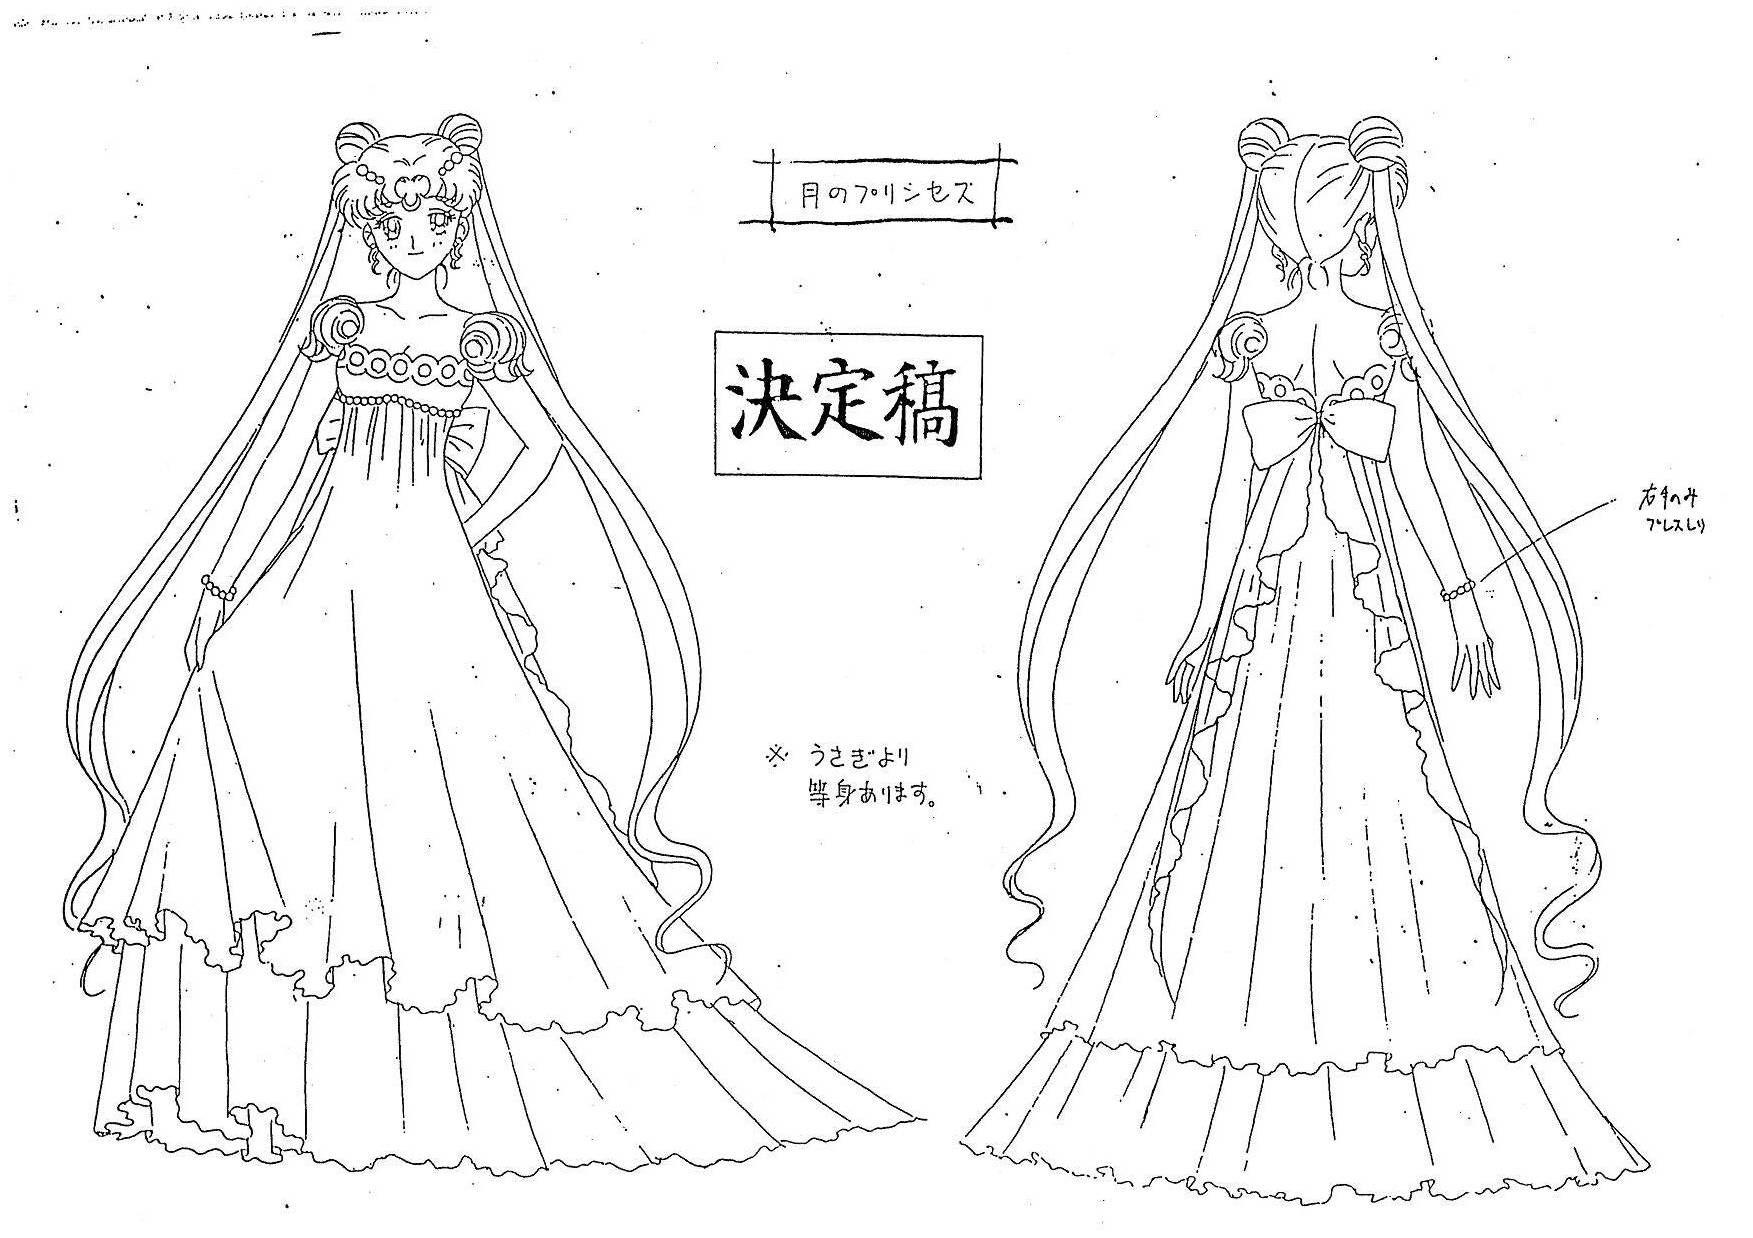 Princess Serenity Model Sheet2 by chewychomp on DeviantArt